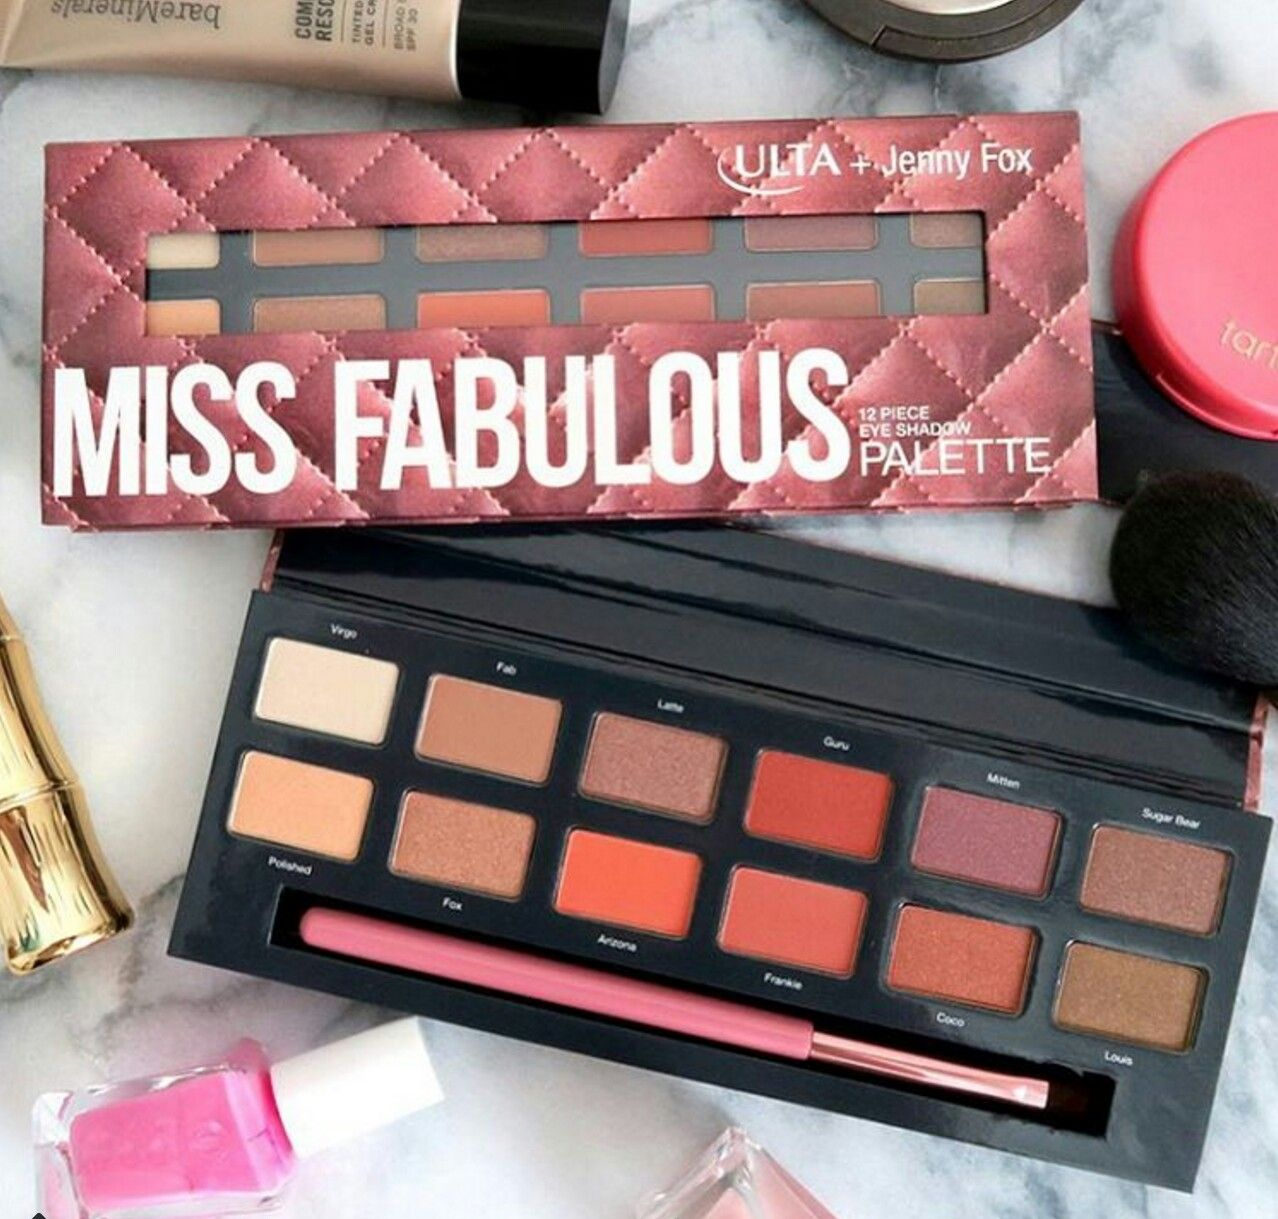 Ulta Miss Fabulous Palette Dupe To Anastasia Modern Renaissance Kc